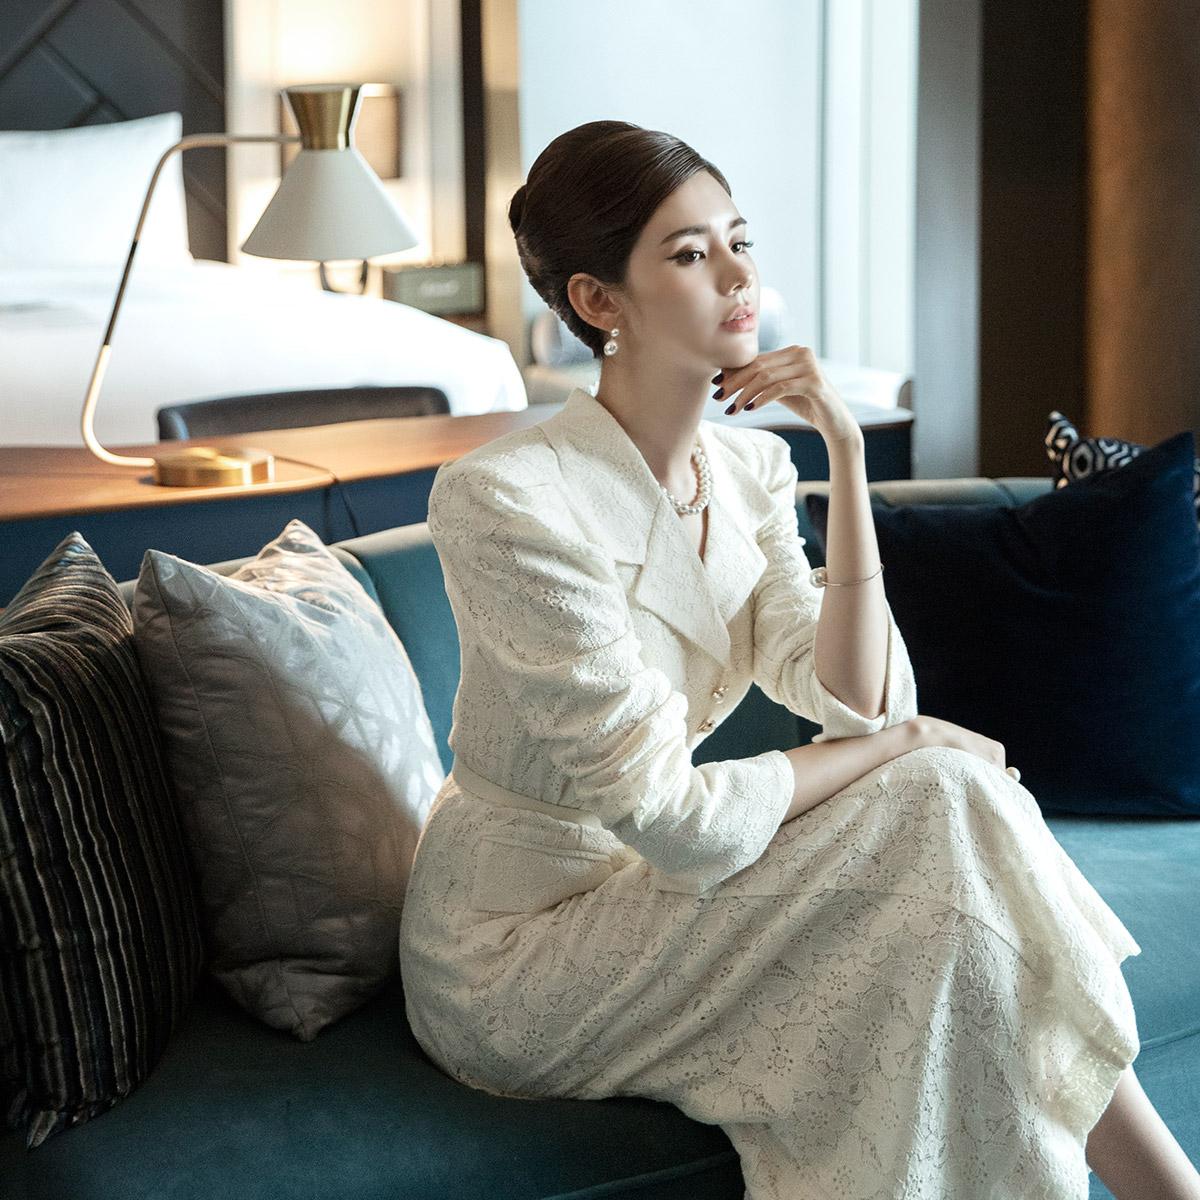 Korean D3907 Luxury Lace Pearl Button Dress (Belt set) (3rd REORDER)